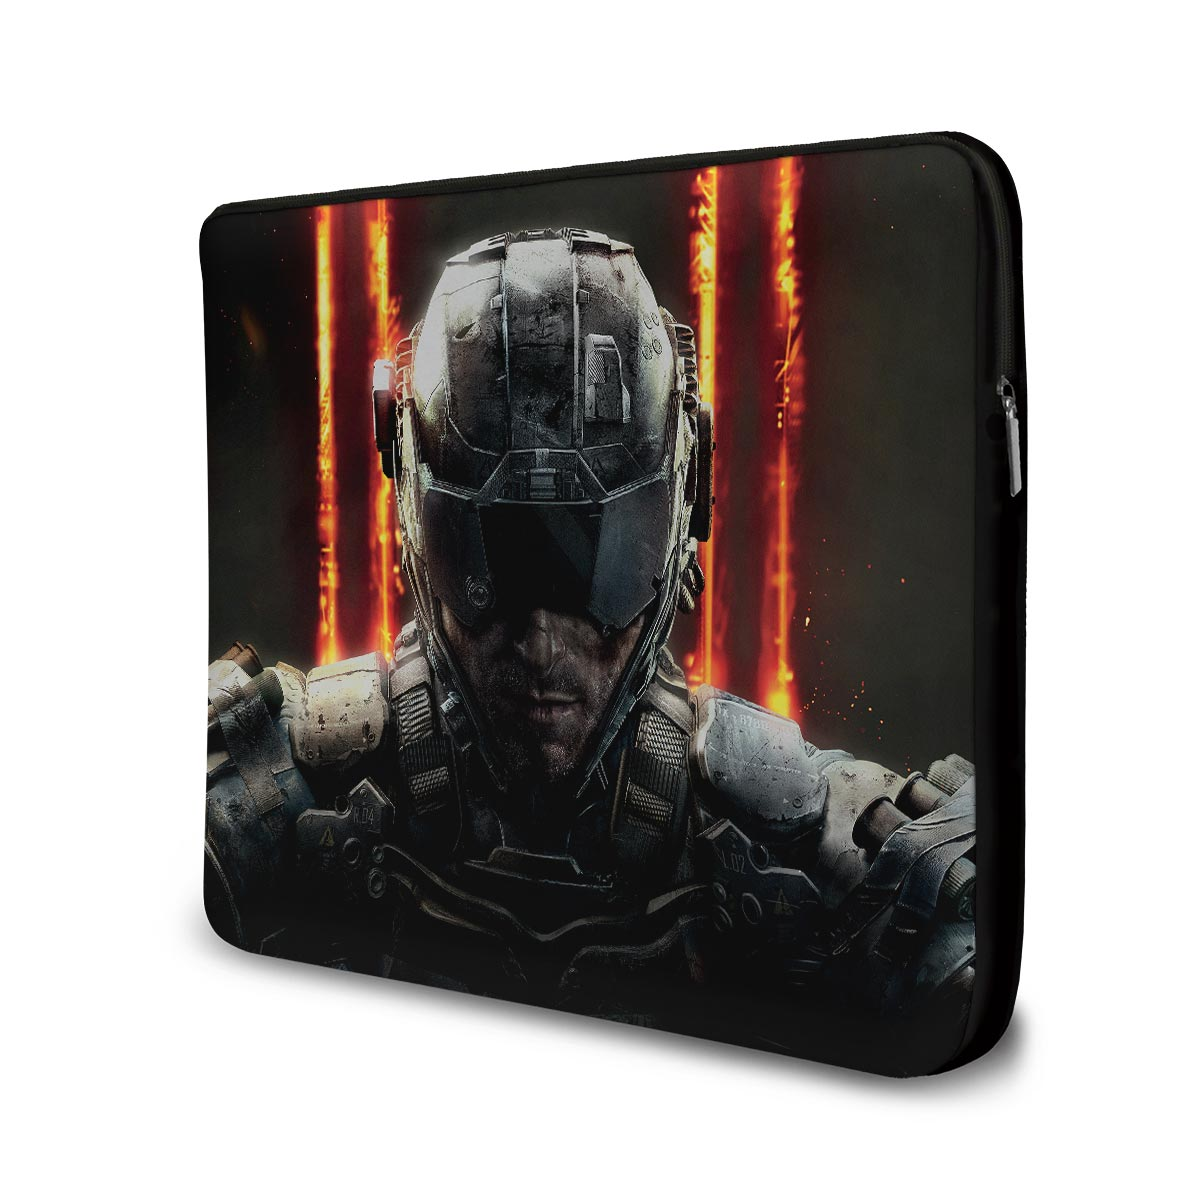 Capa de Notebook Call Of Duty Soldier 2015